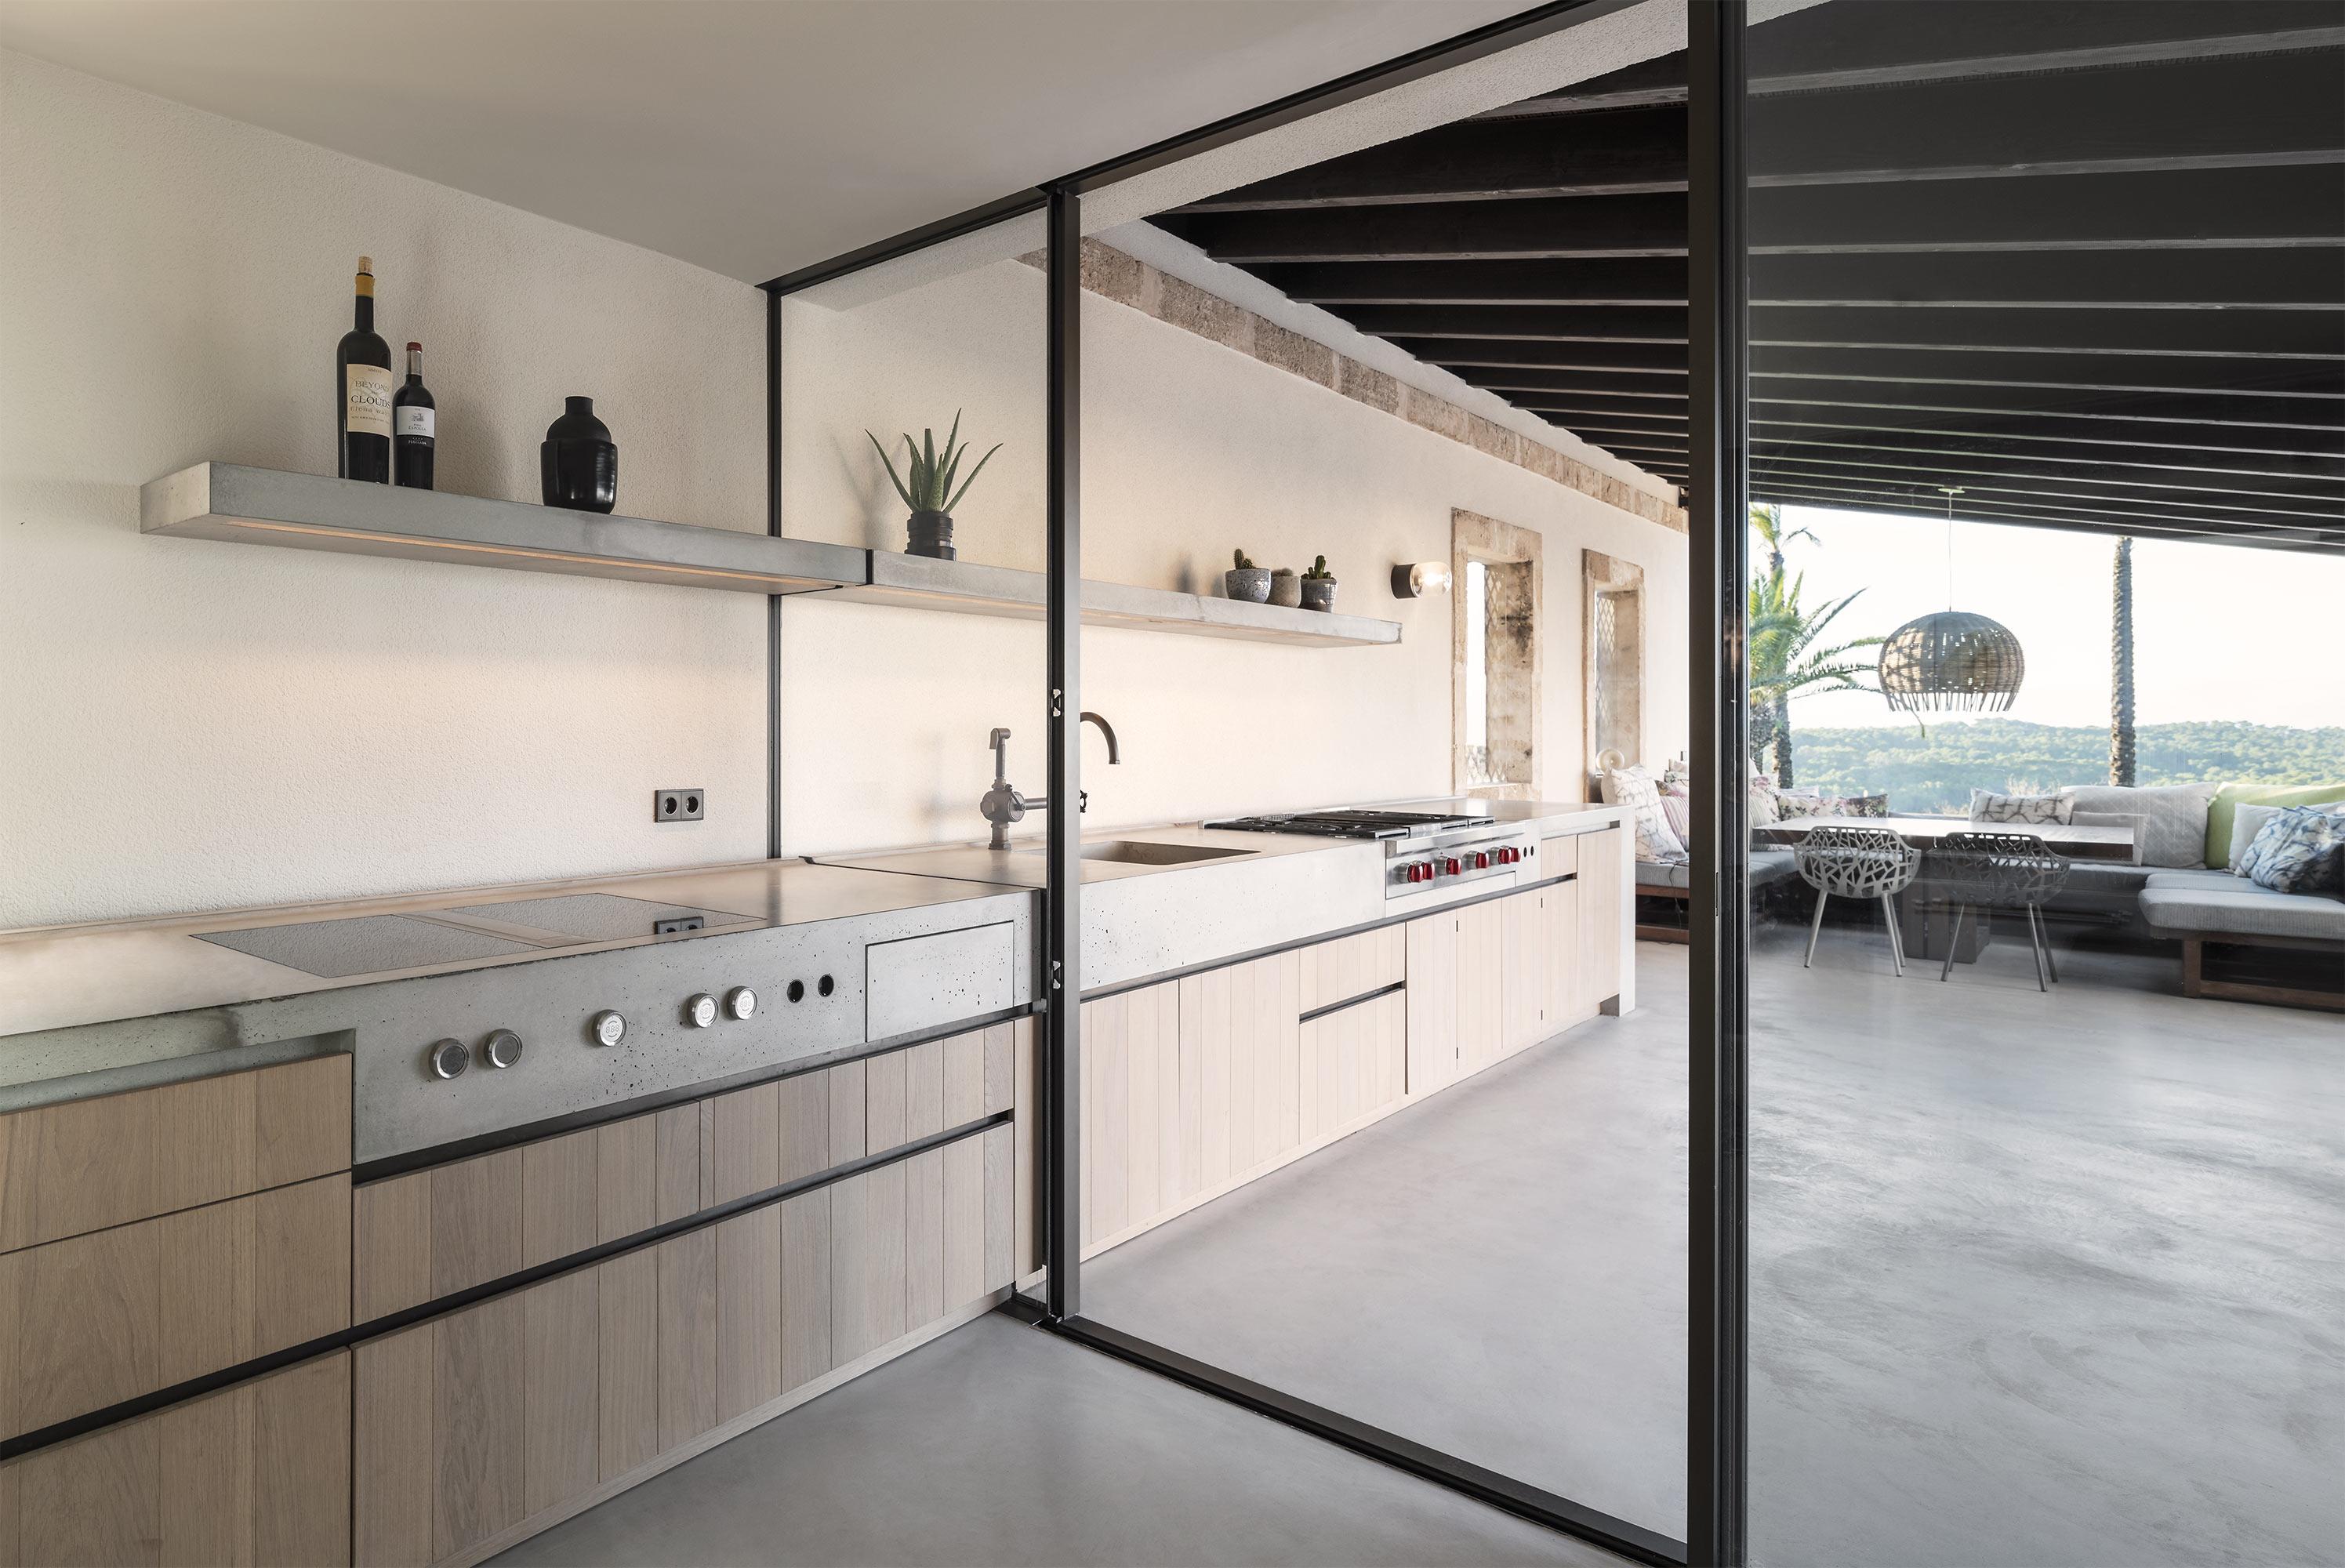 Sky-Frame Fenster in der Küche